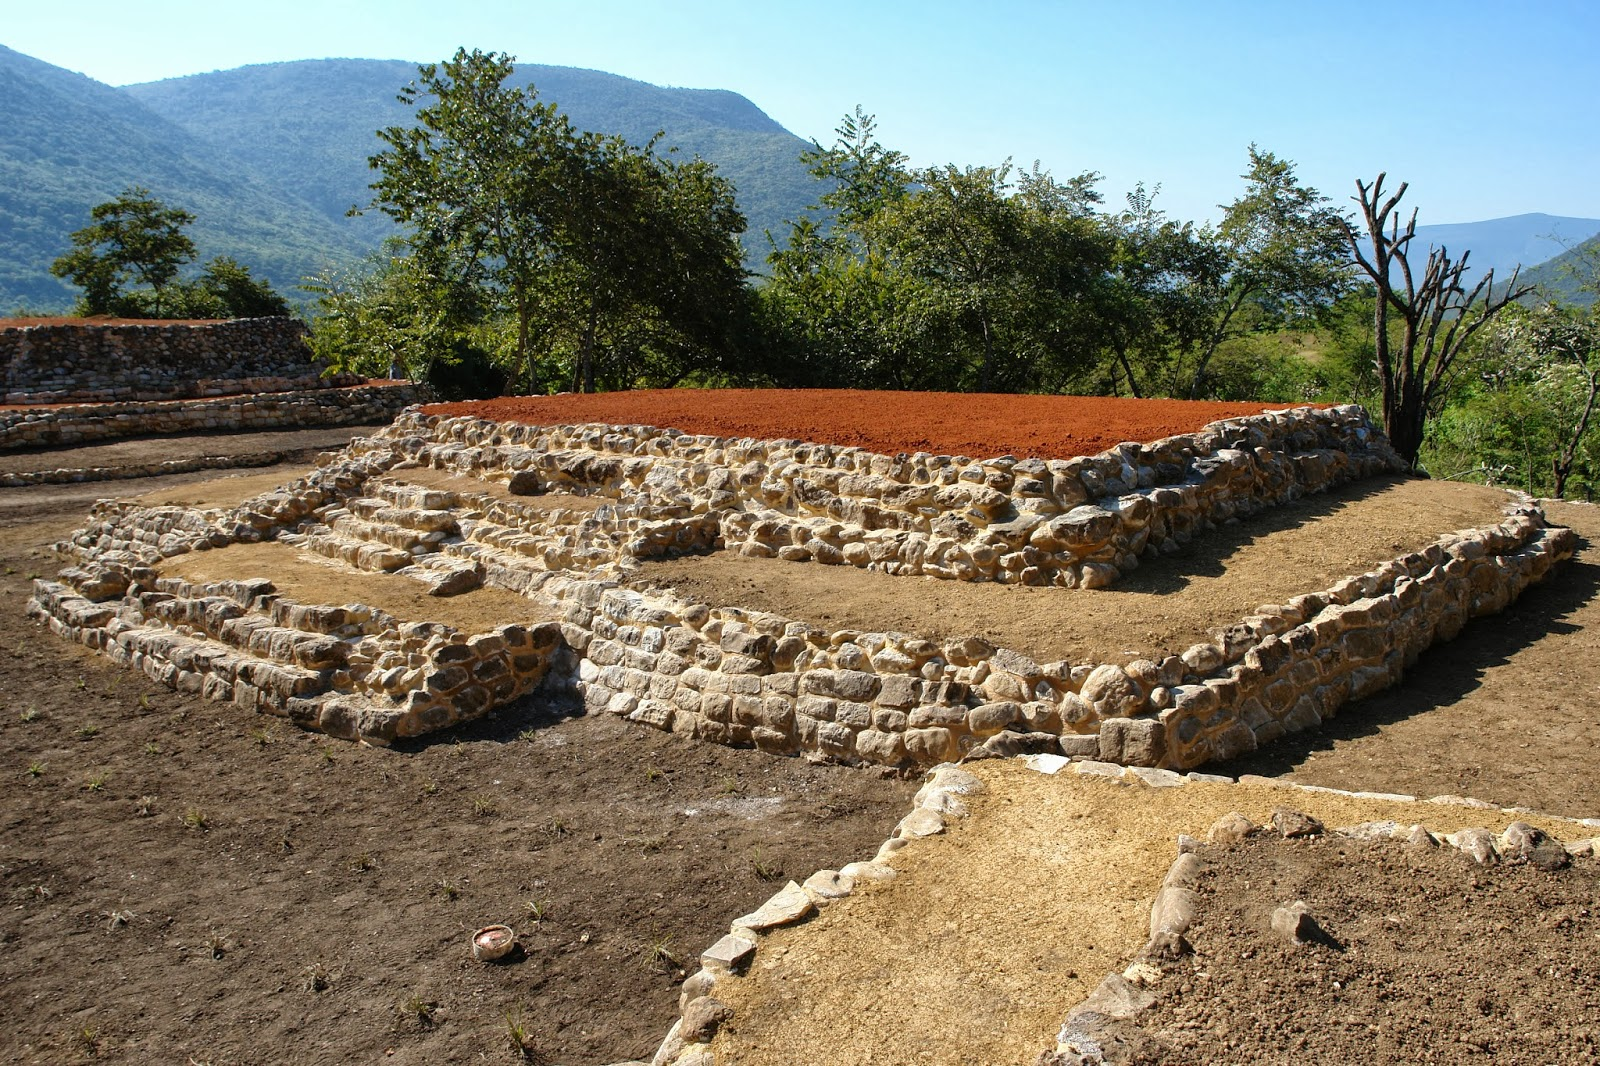 Vista de la zona arqueológica de Tancama de Jalpan de Serra